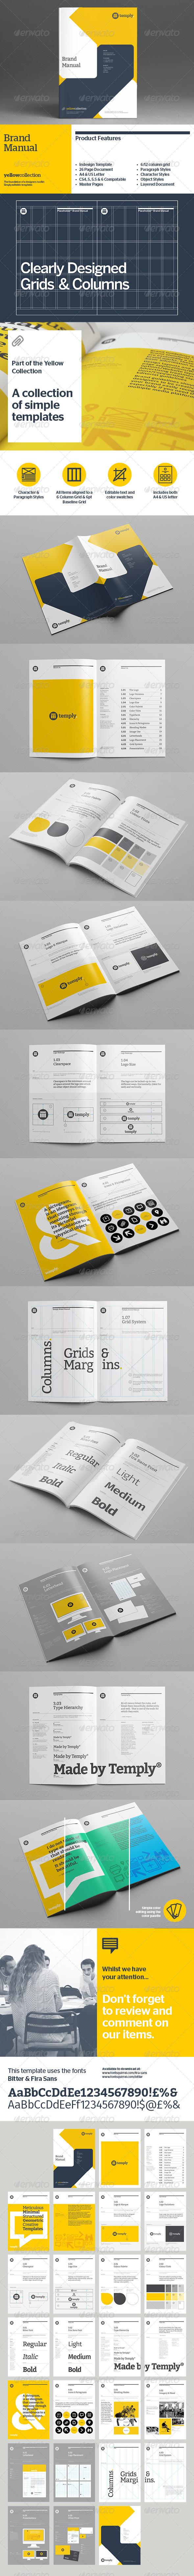 GraphicRiver Brand Manual Template 8536178